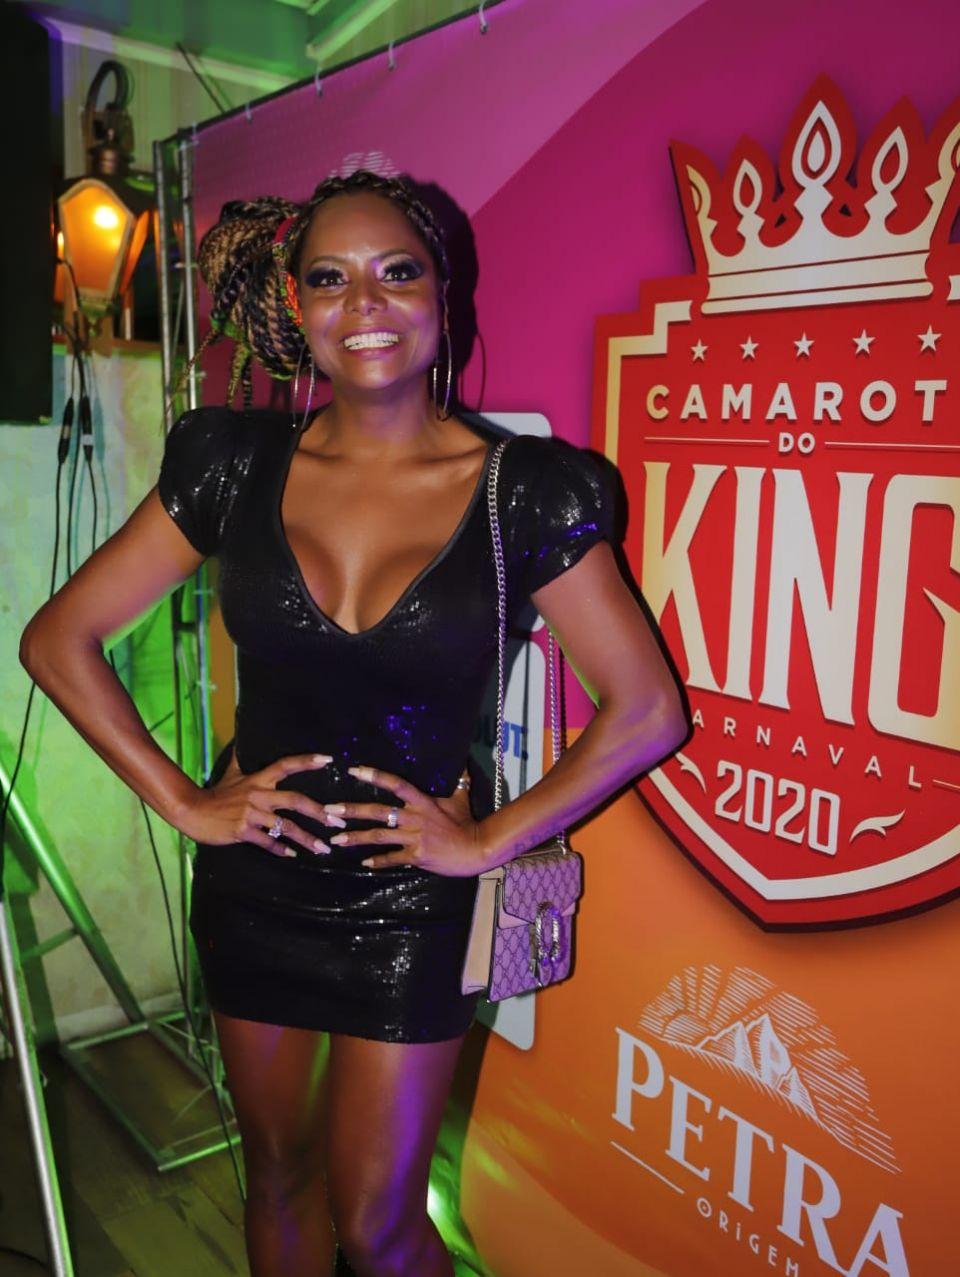 Adriana Bombom será a musa do Camarote do King neste Carnaval